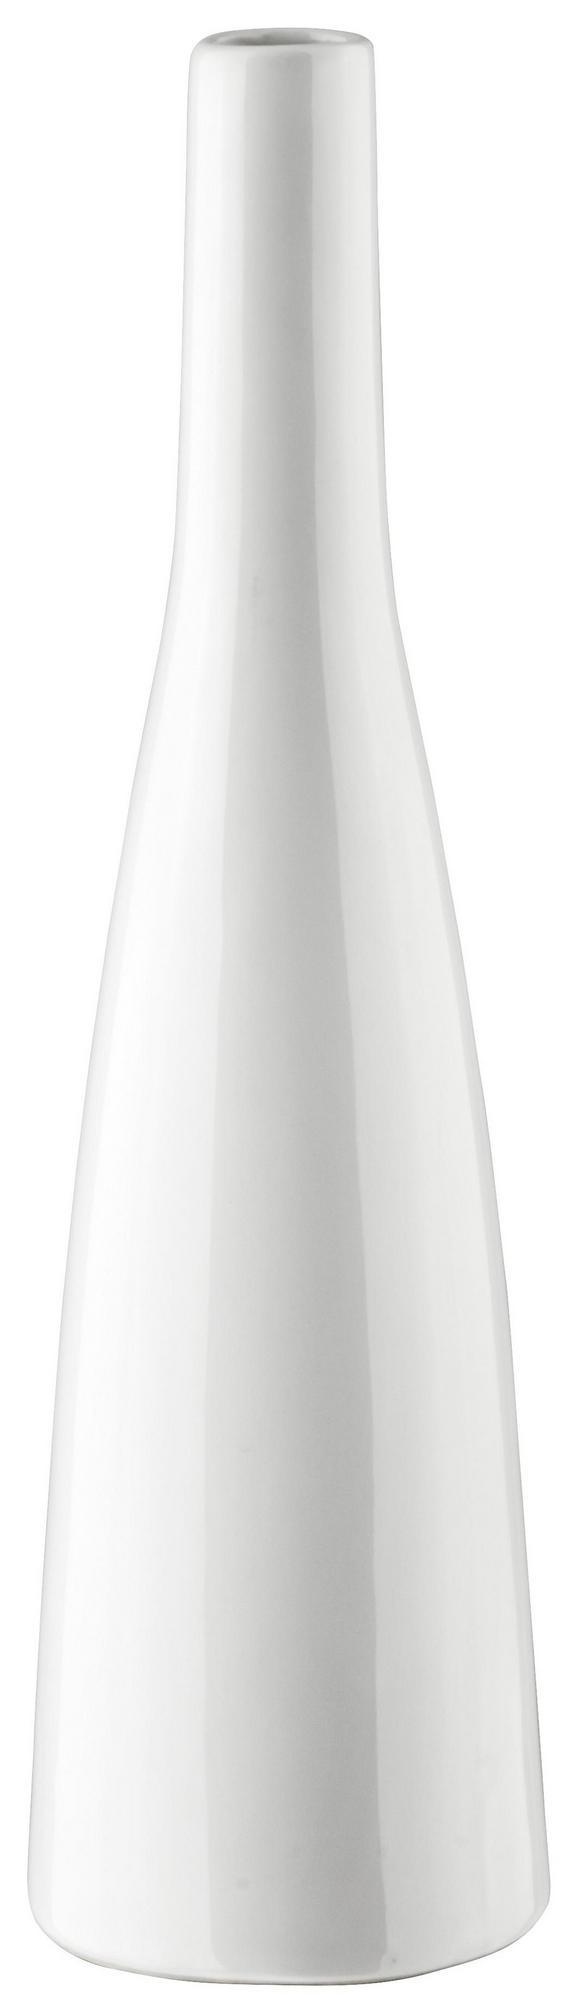 Vaza Plancio - bela, Moderno, keramika (33cm) - Mömax modern living